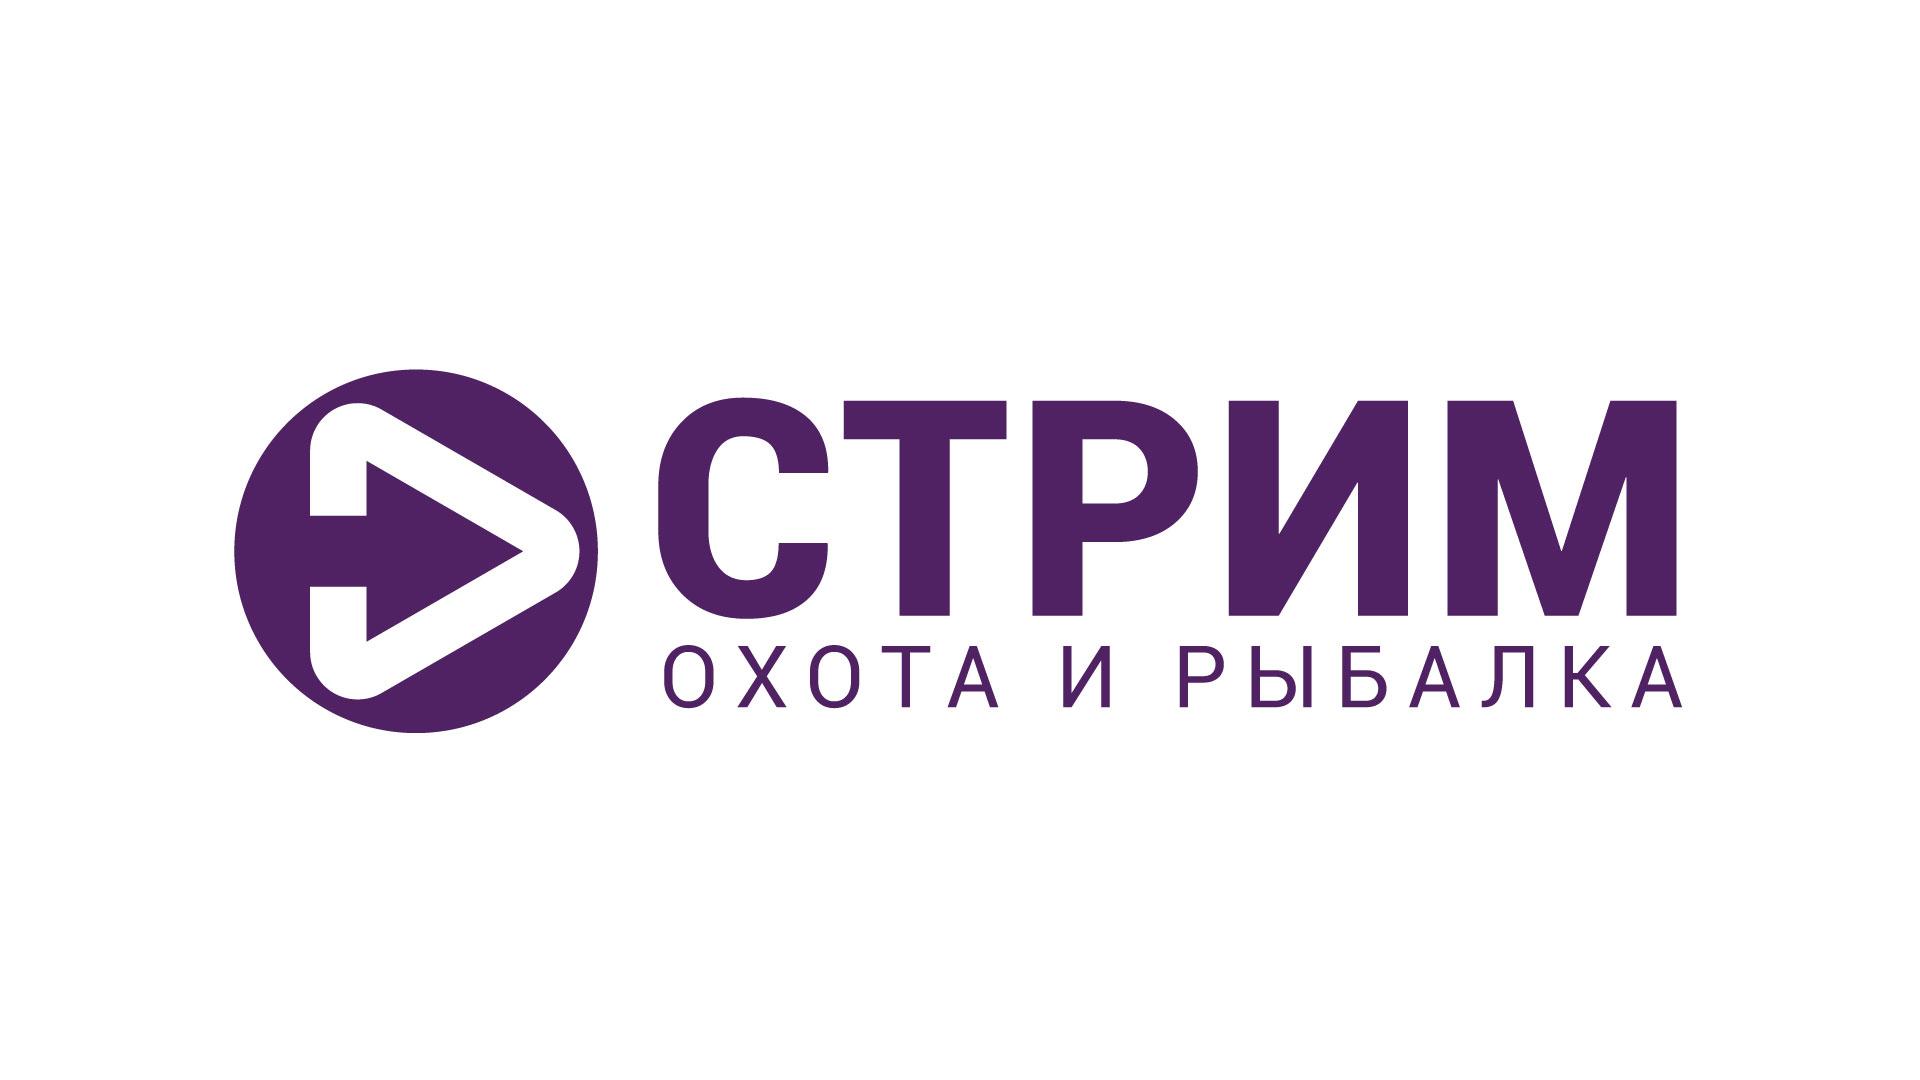 Создание концепции заставки и логотипа (телеканал) фото f_673566e82b754d93.jpg